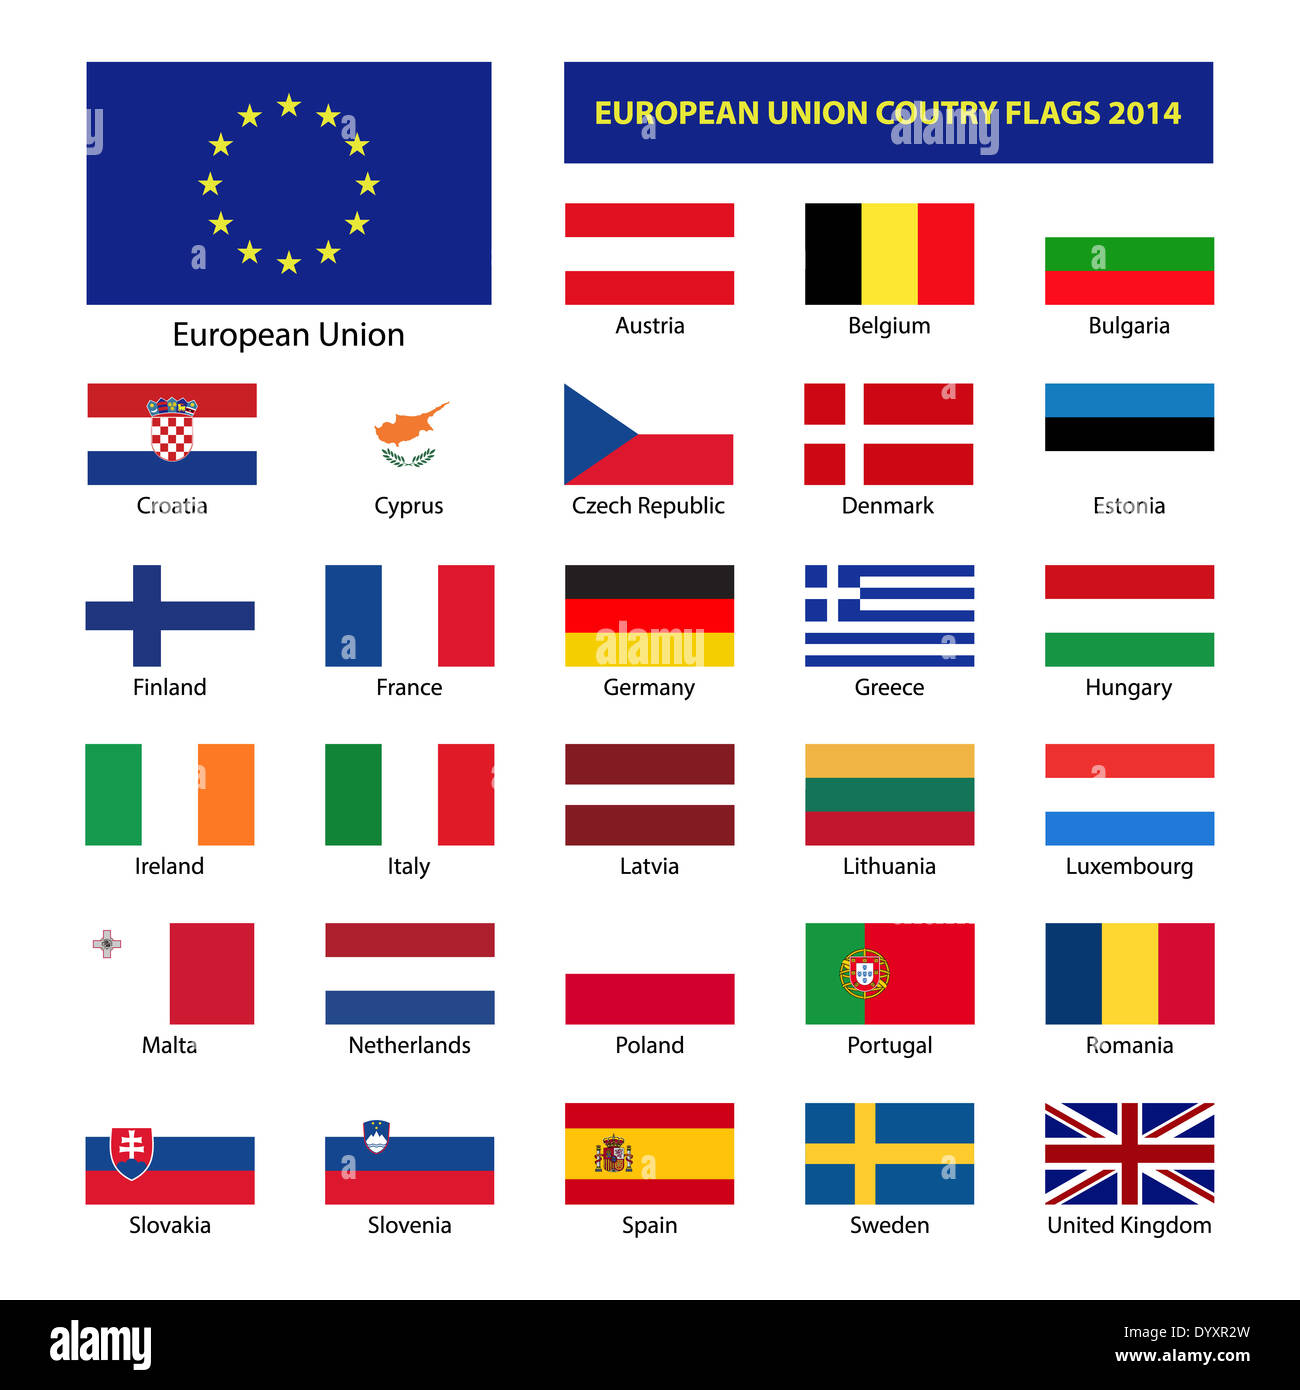 European Union country flags, member states EU - Stock Image